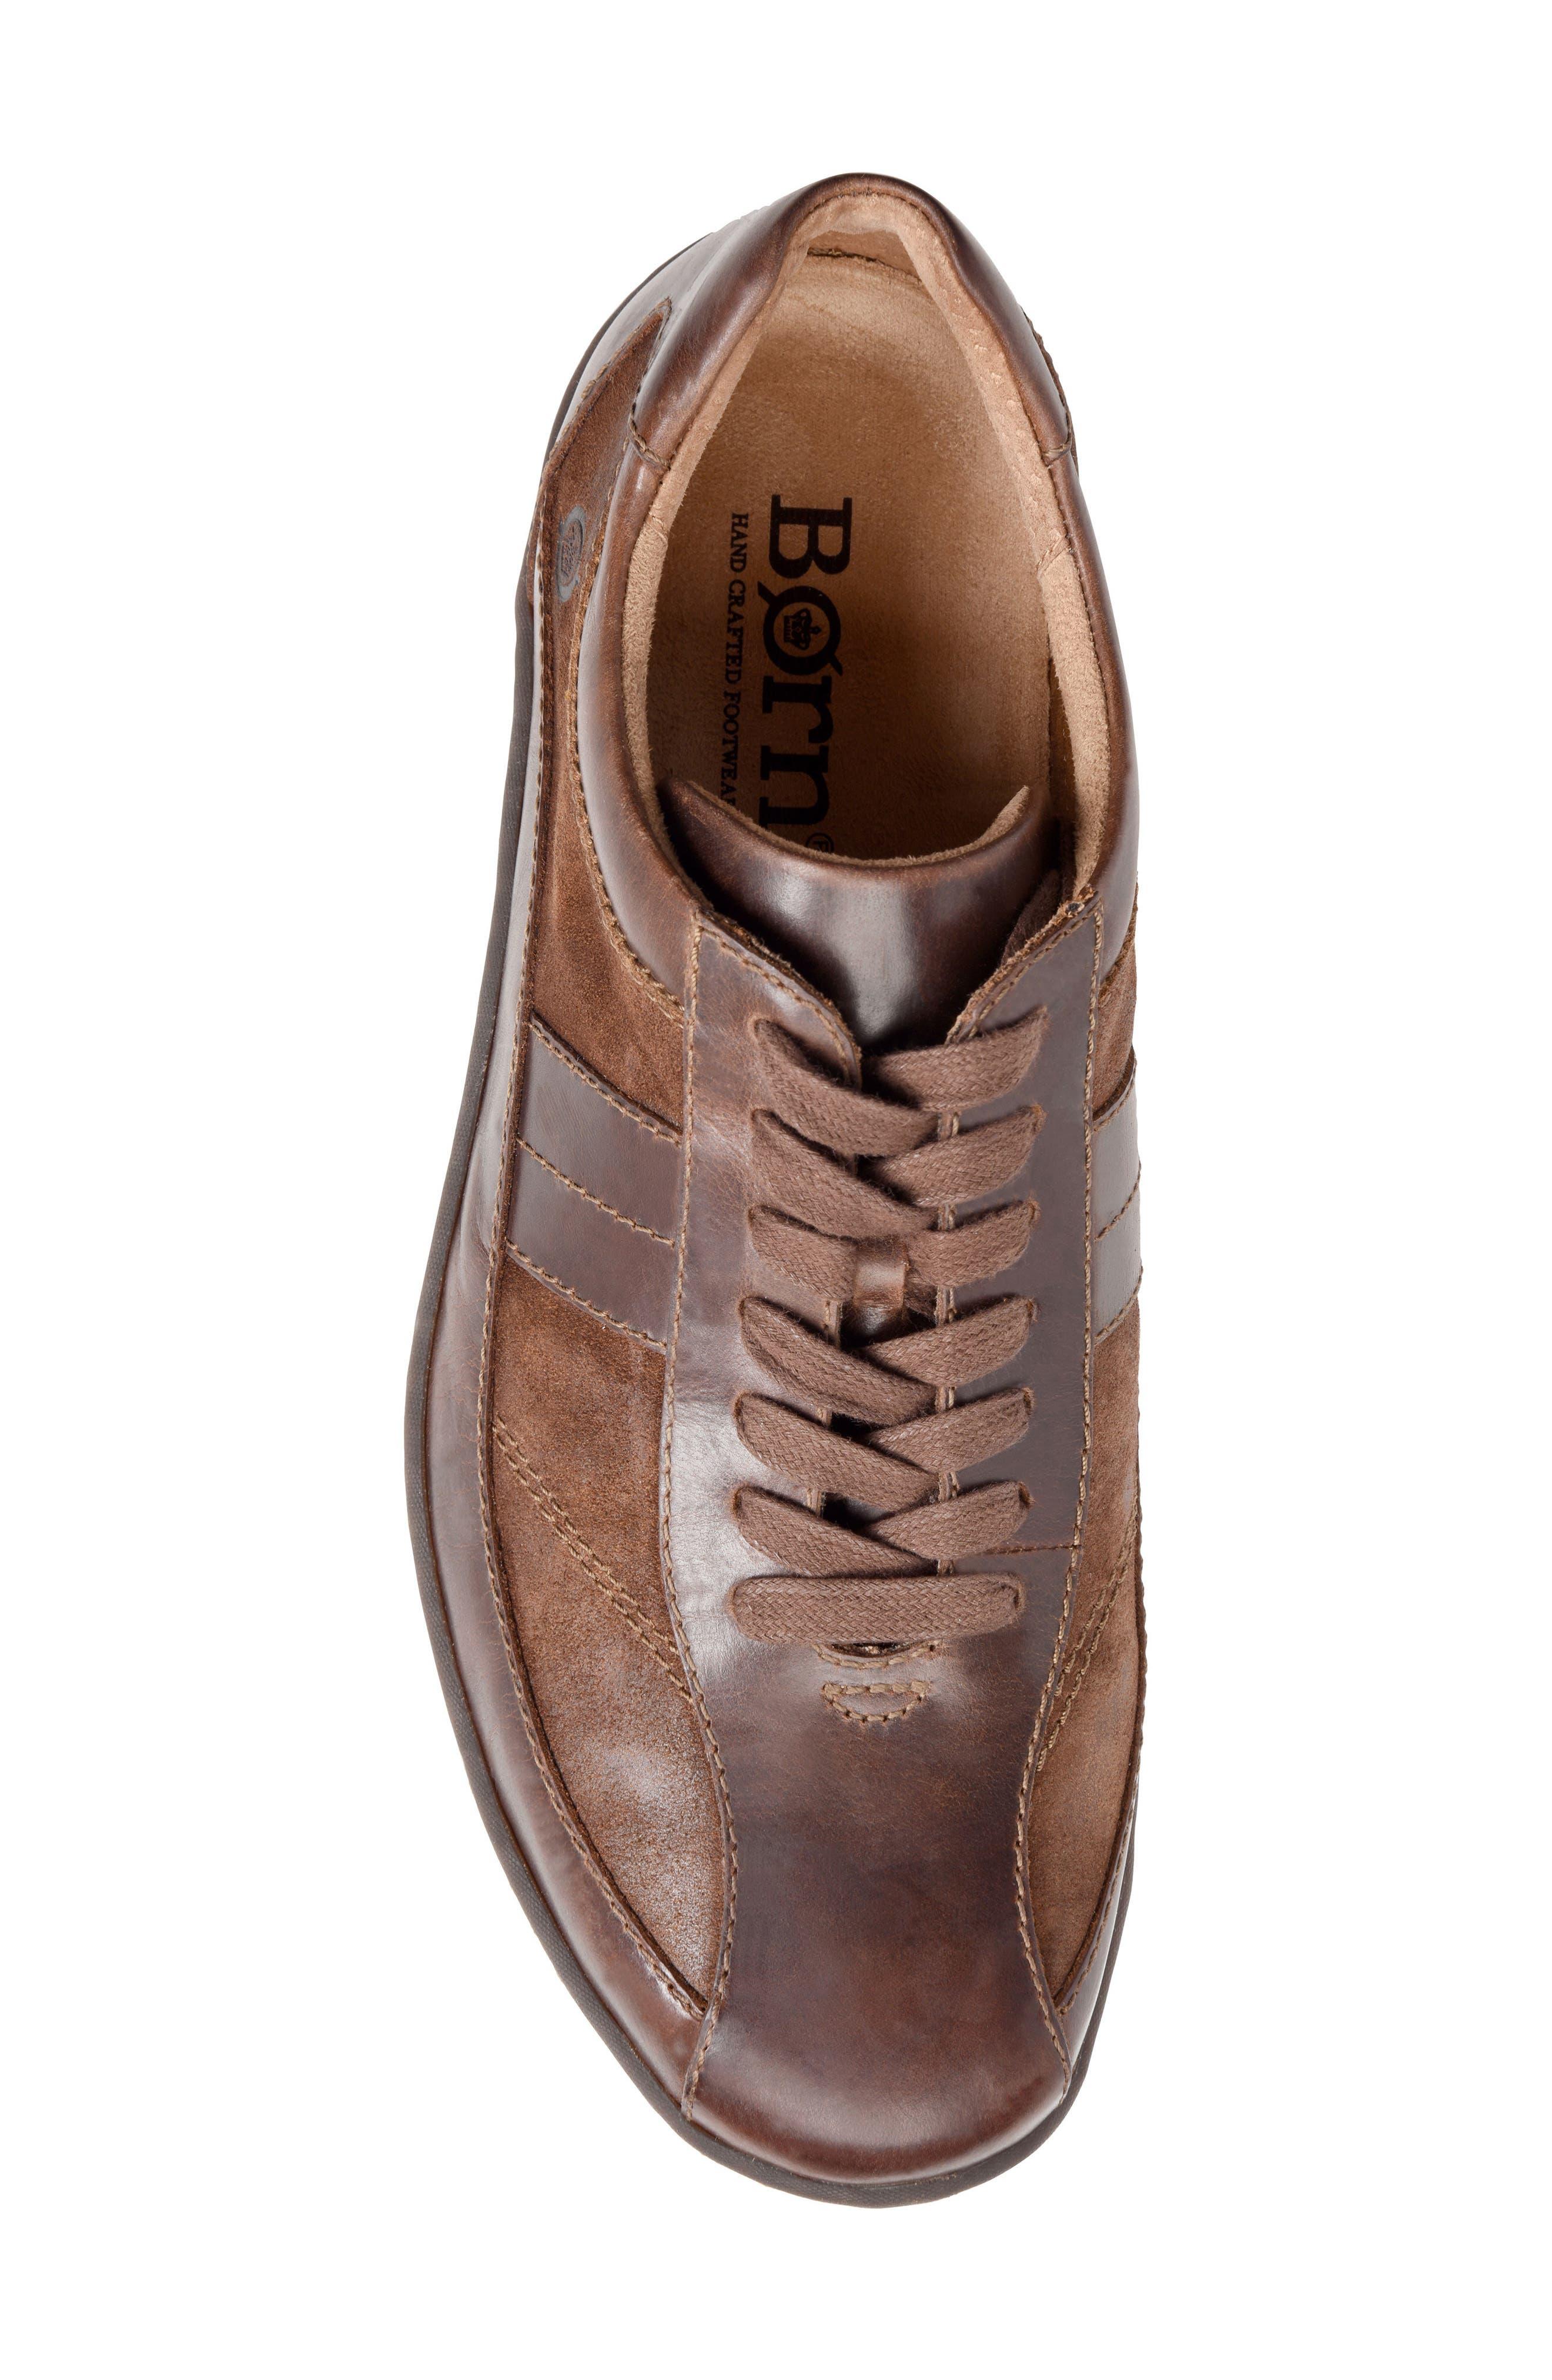 BØRN,                             Breves Low Top Sneaker,                             Alternate thumbnail 5, color,                             230